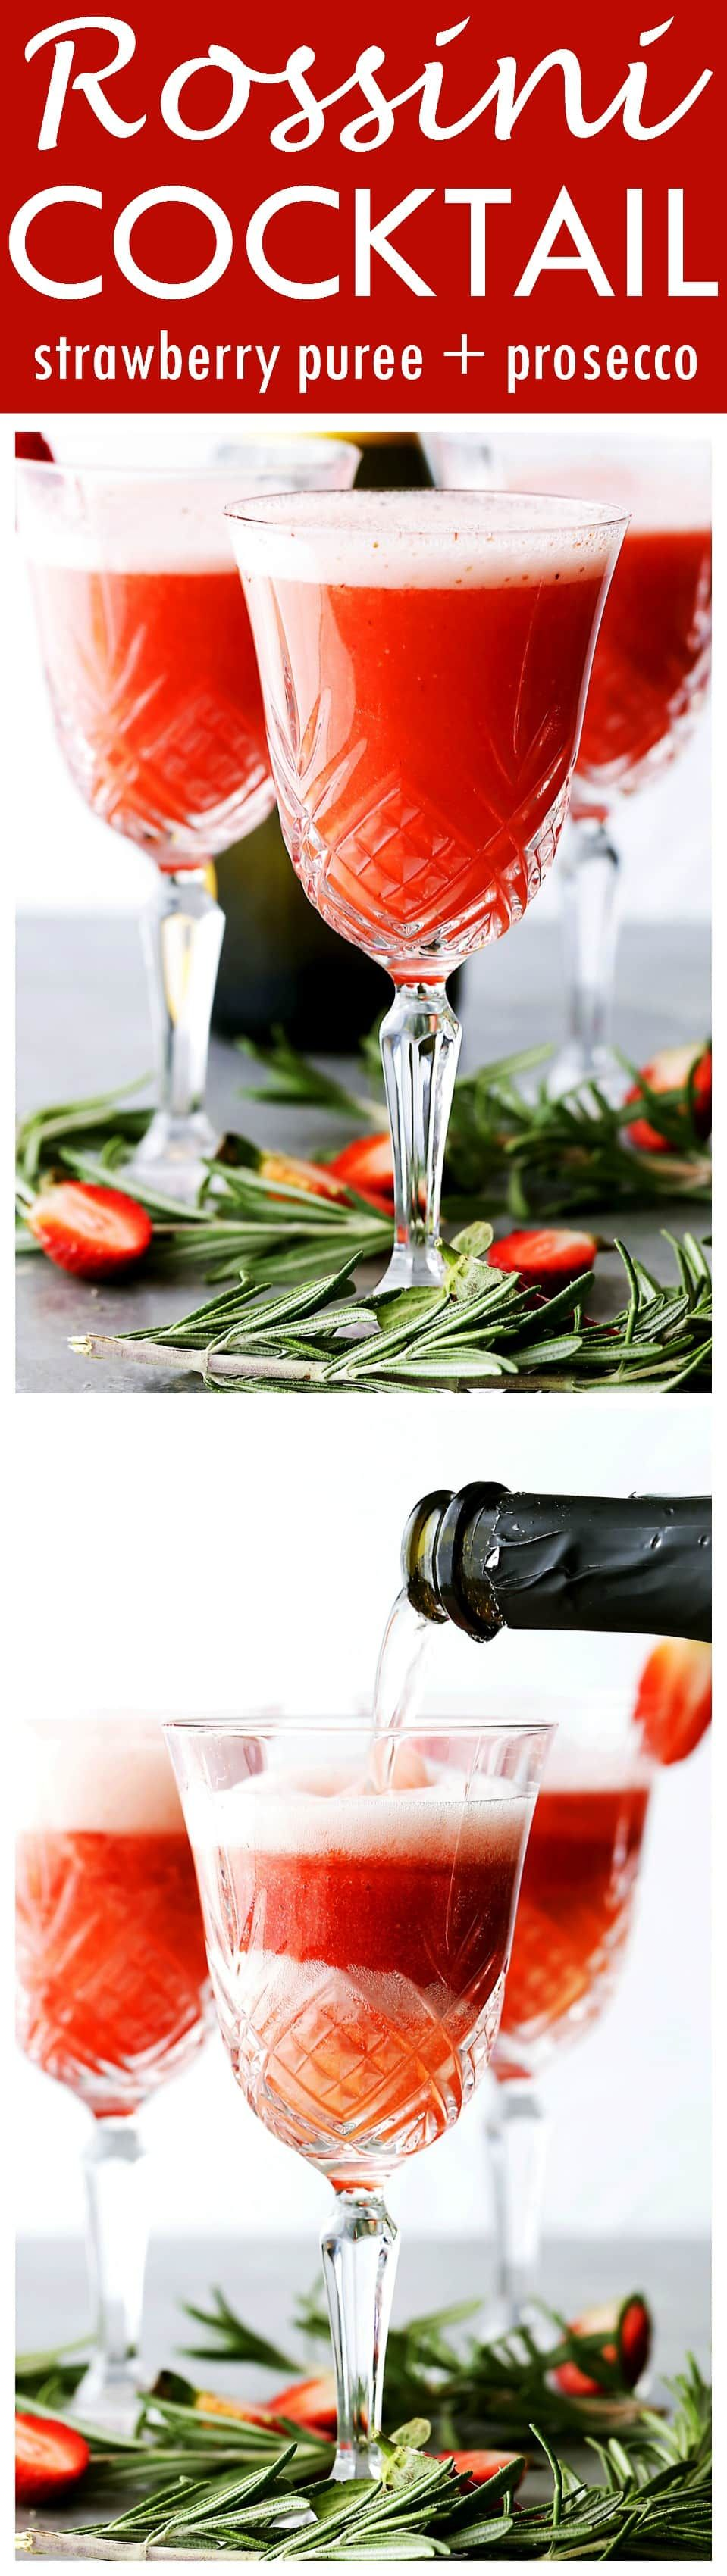 Rossini cocktail festive and delicious